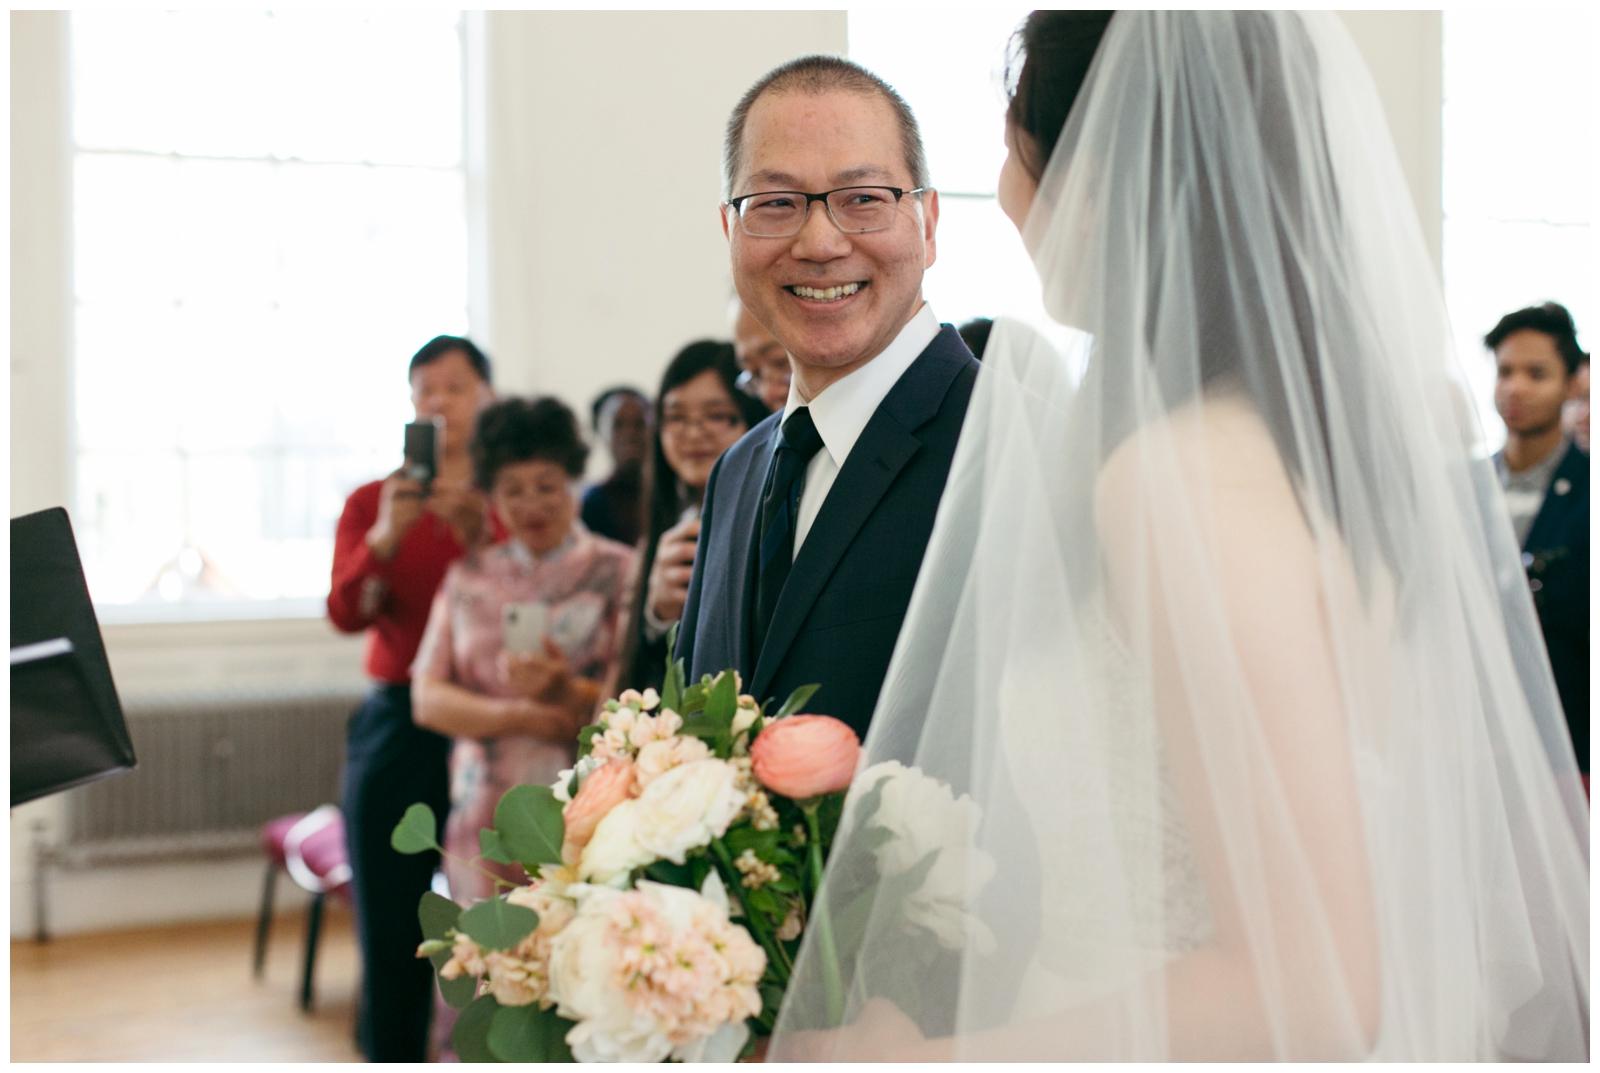 Samberg-Conference-Center-Boston-Wedding-Photographer-Bailey-Q-Photo-047.jpg